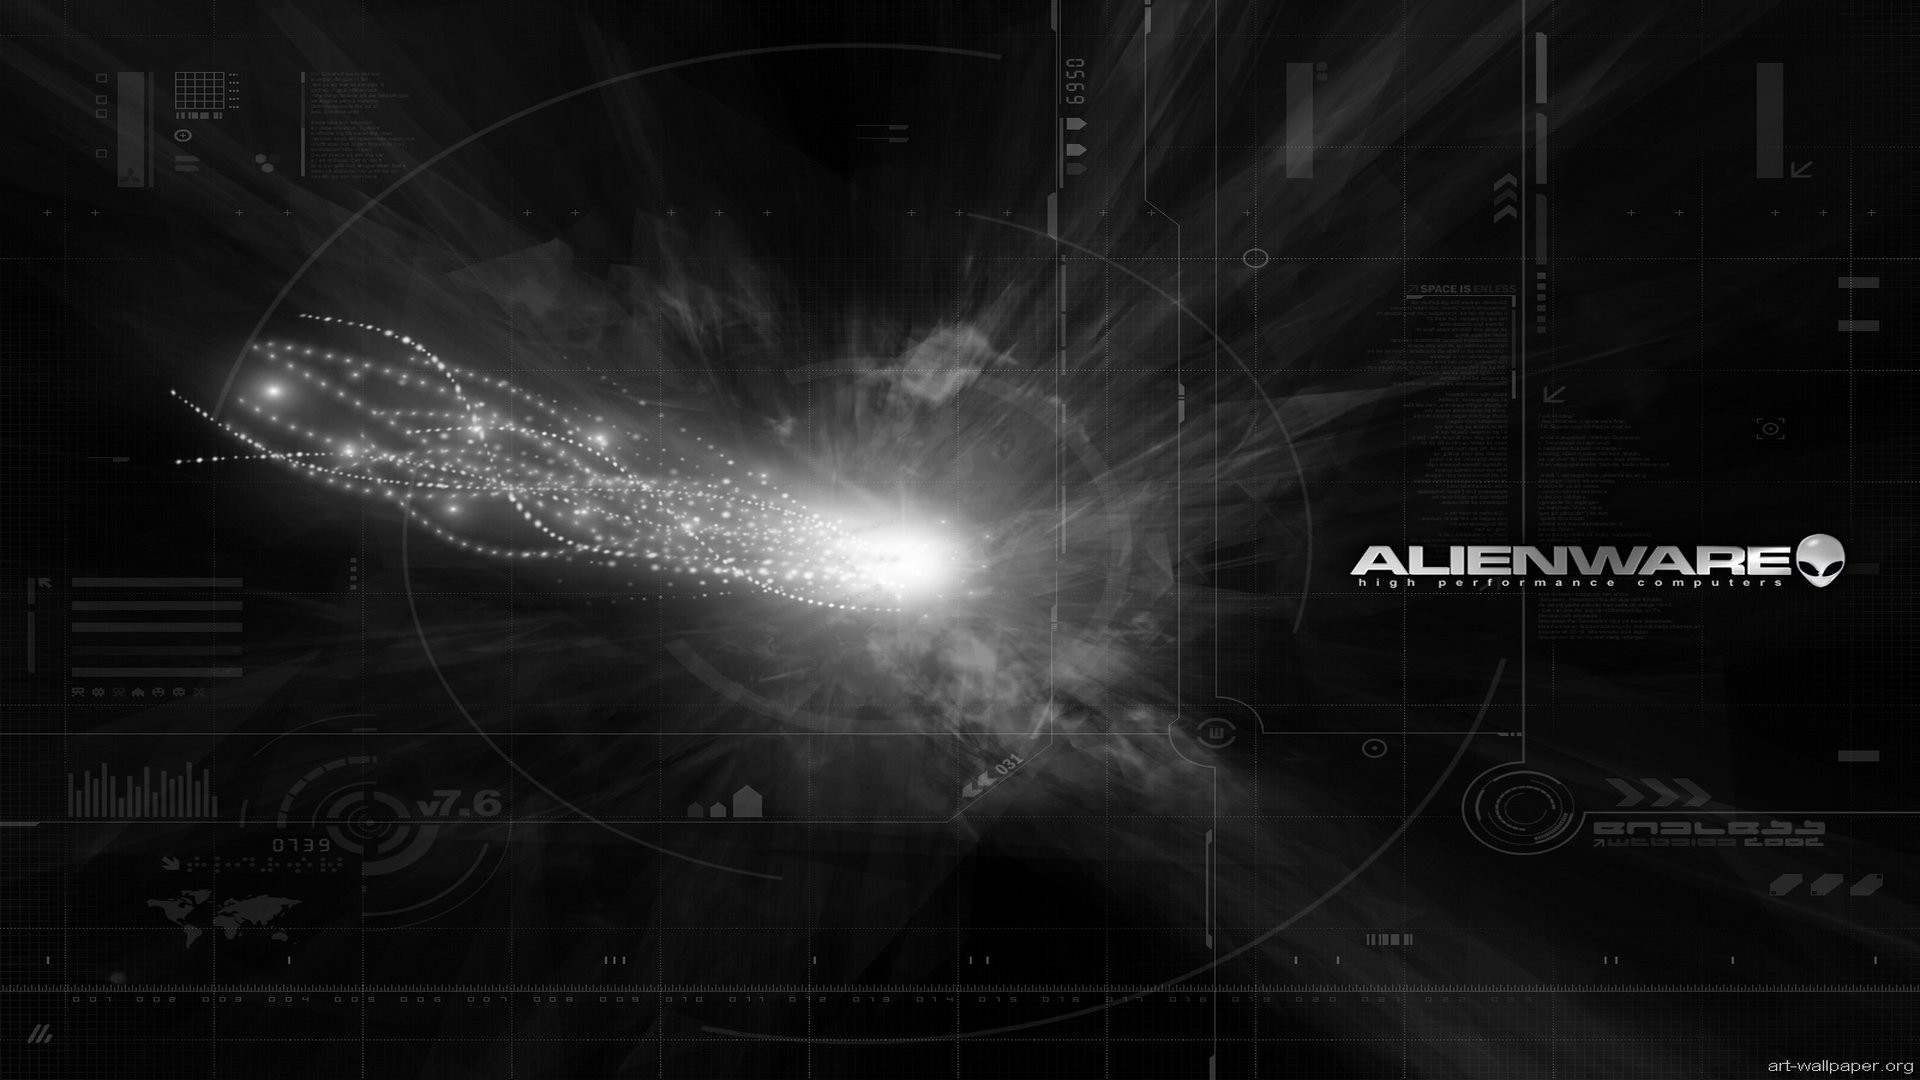 Atemberaubend 4K Alienware Wallpaper (72+ images) &GJ_01